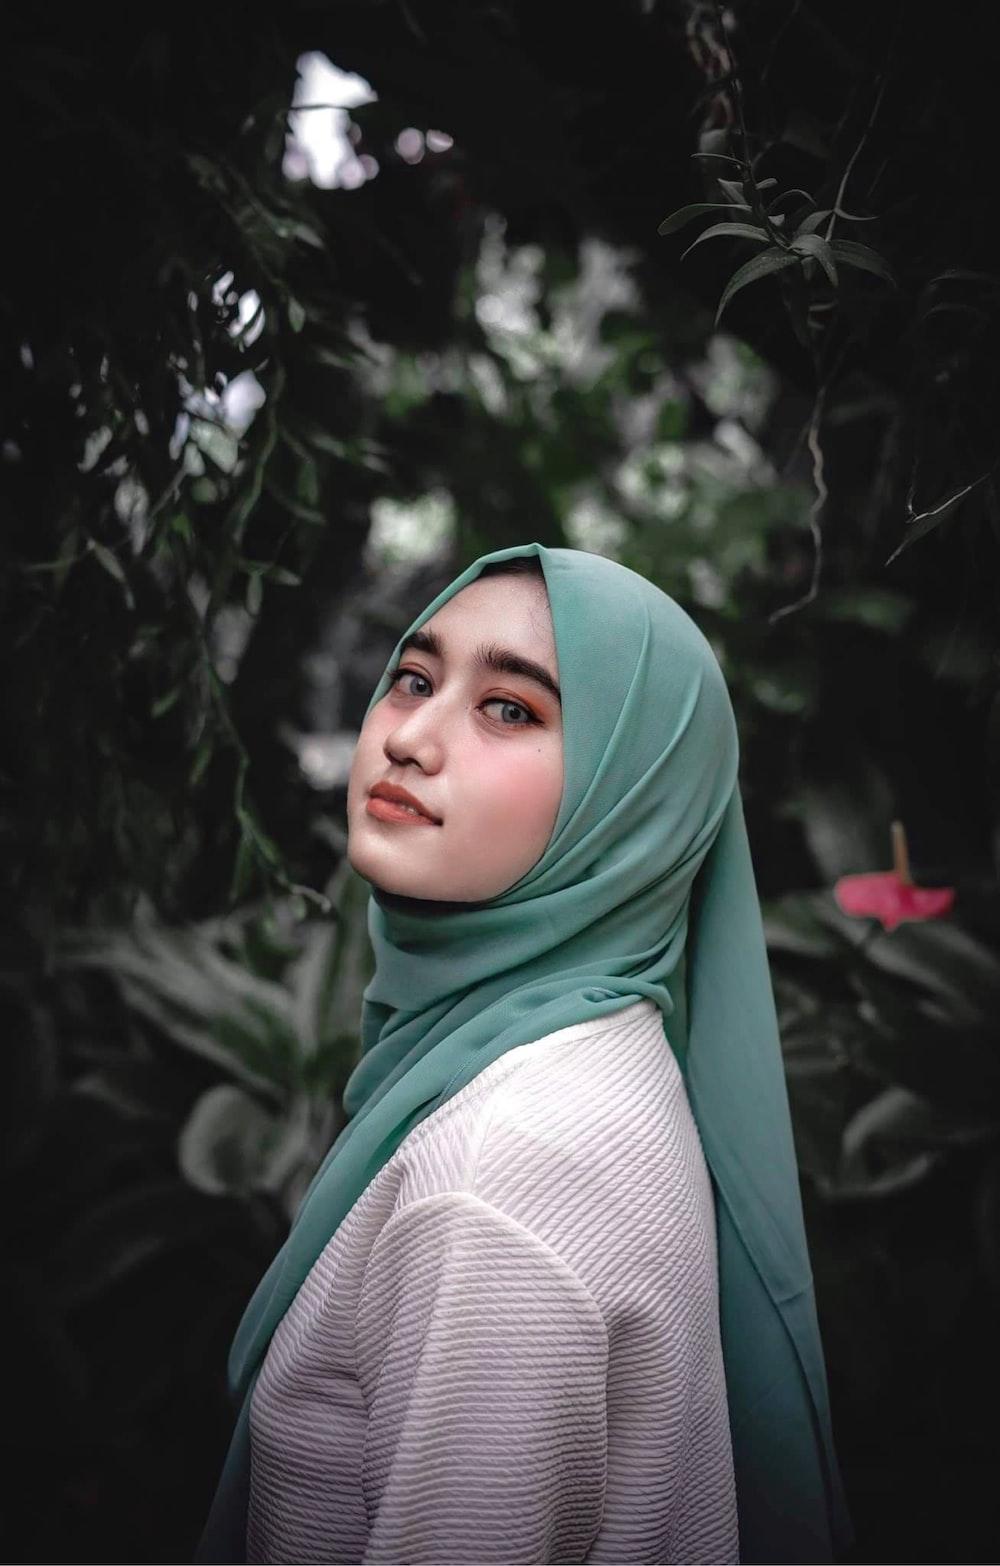 woman in green hijab standing near green plants